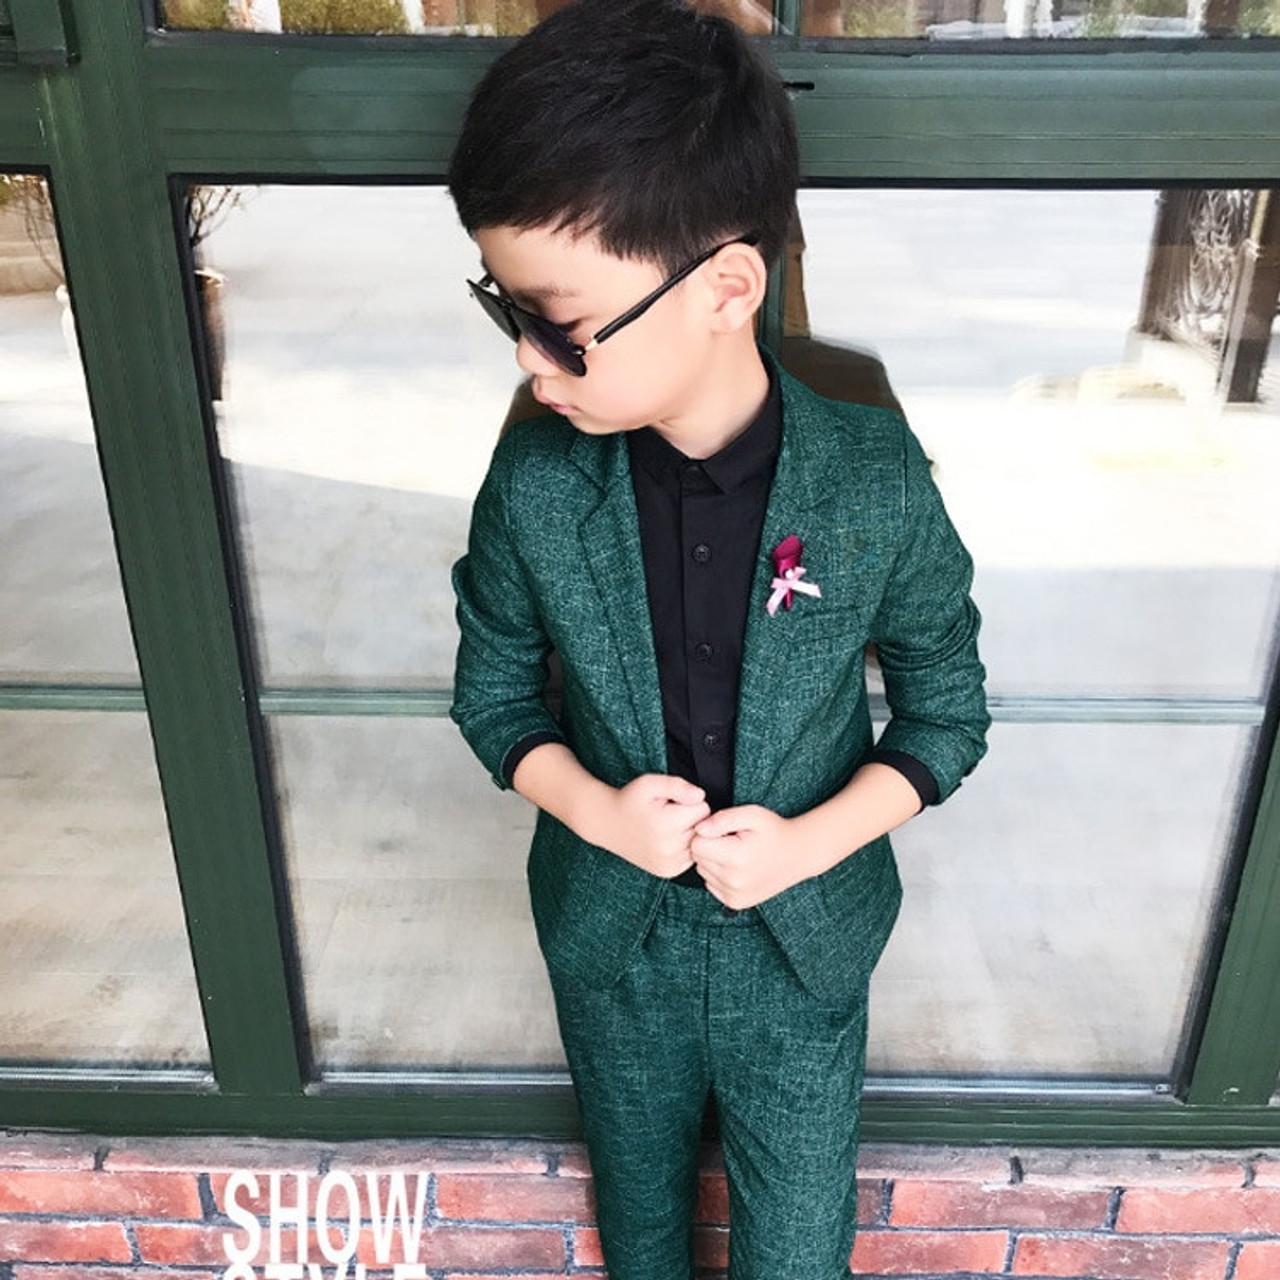 45dbdb557 Kids Blazer Baby Boys Suit Jackets 2018 Spring Cotton Coat Pants 2 ...